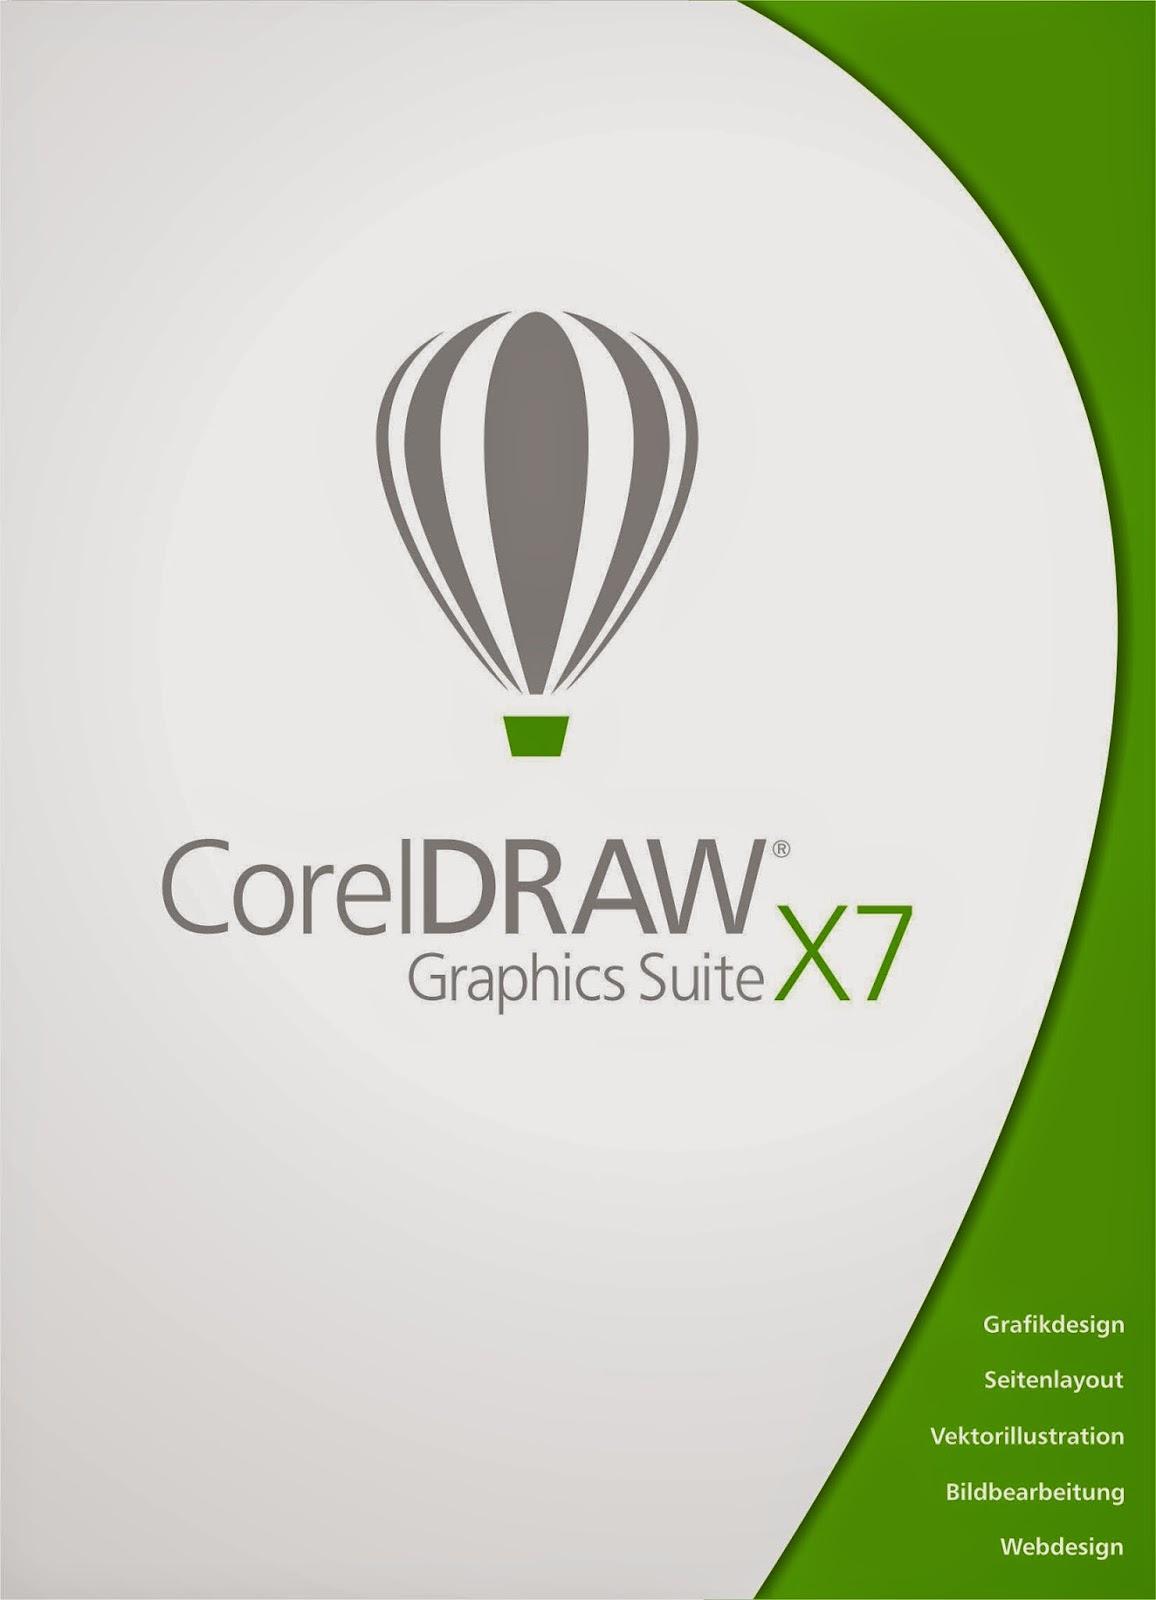 1562 CorelDRAW Graphics Suite X7 17.1.0.572 Multilingual